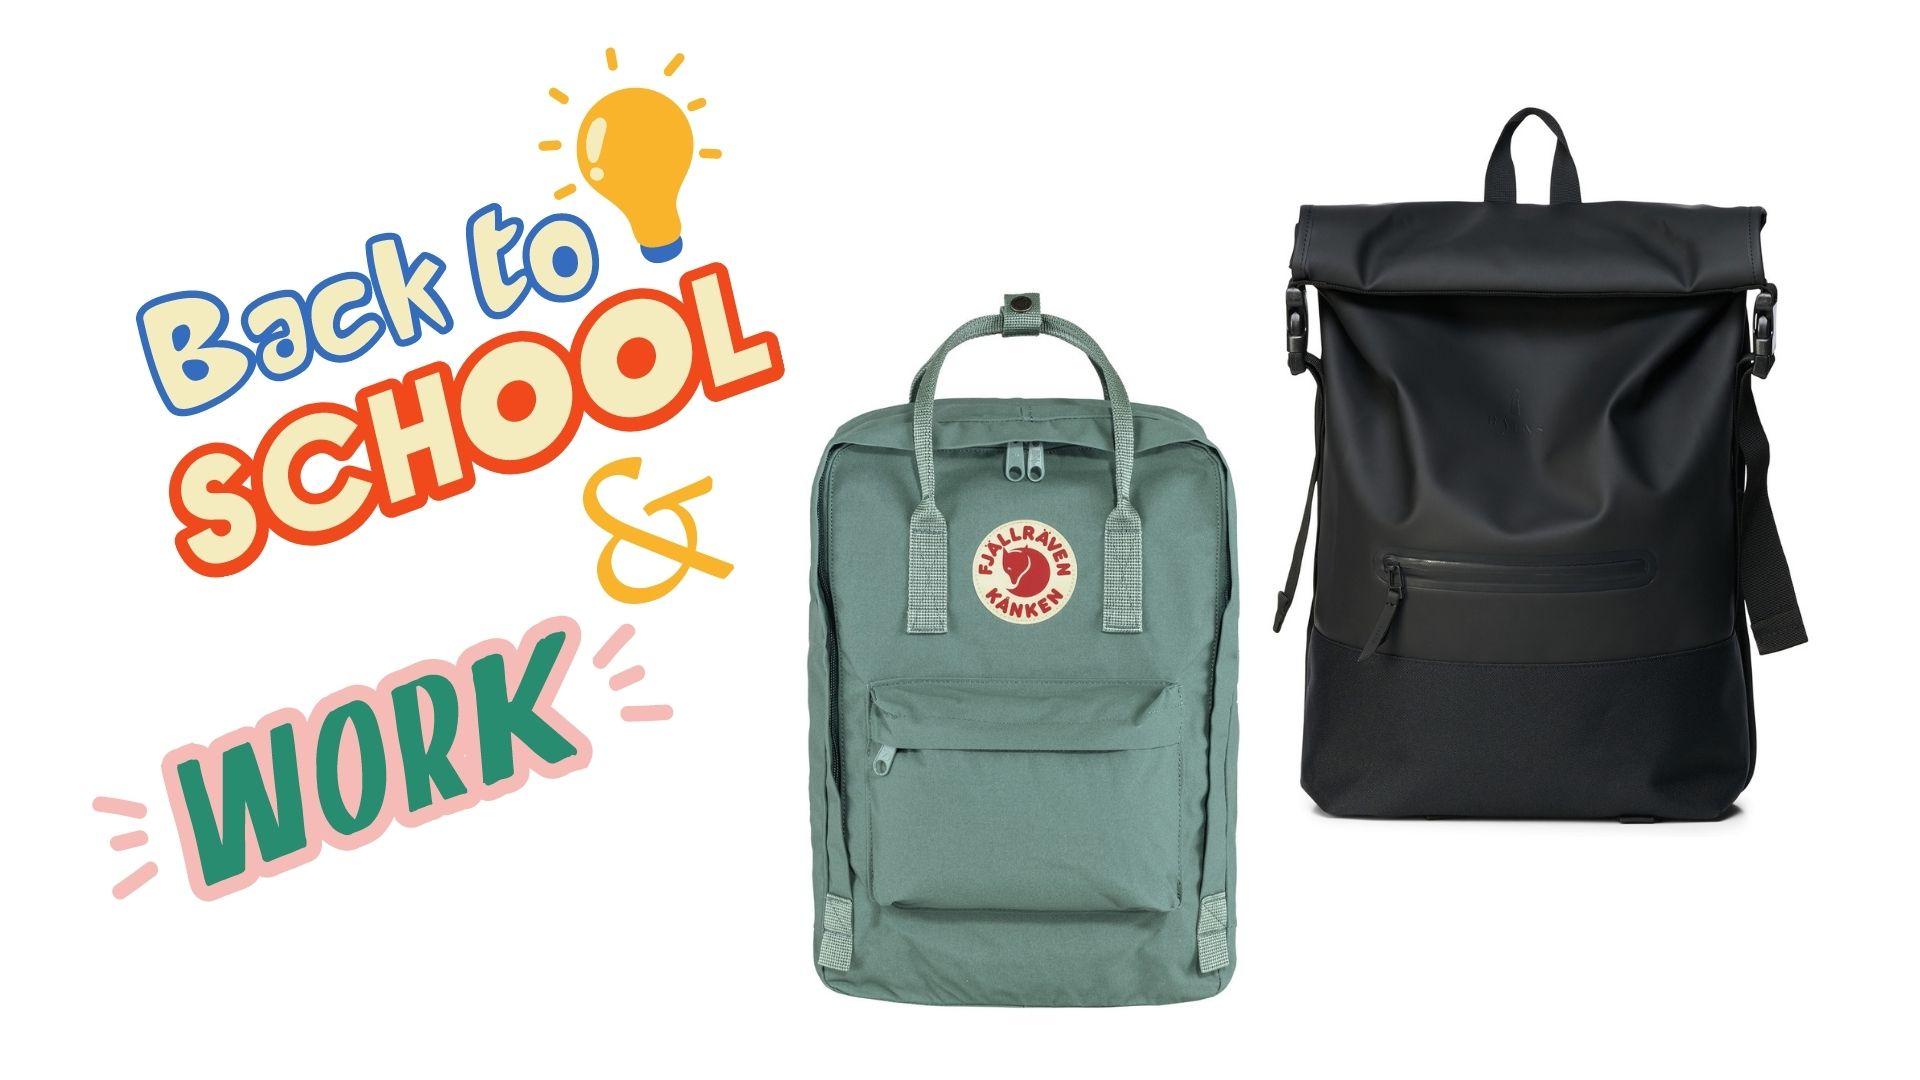 Back to school rugzak